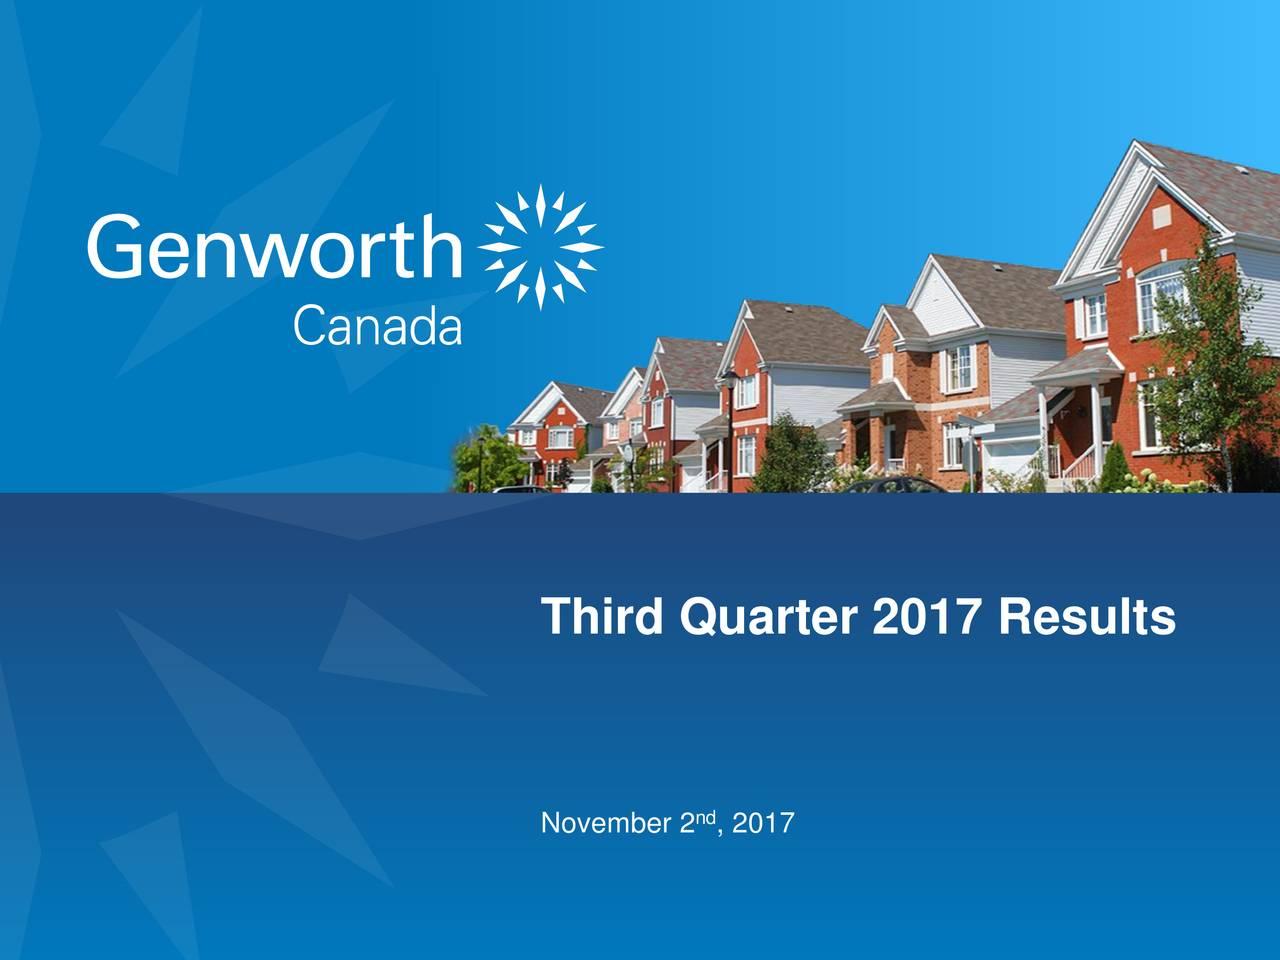 November 2 , 2017 Q3 2017 ResuGenworth MI Canad1 Inc.